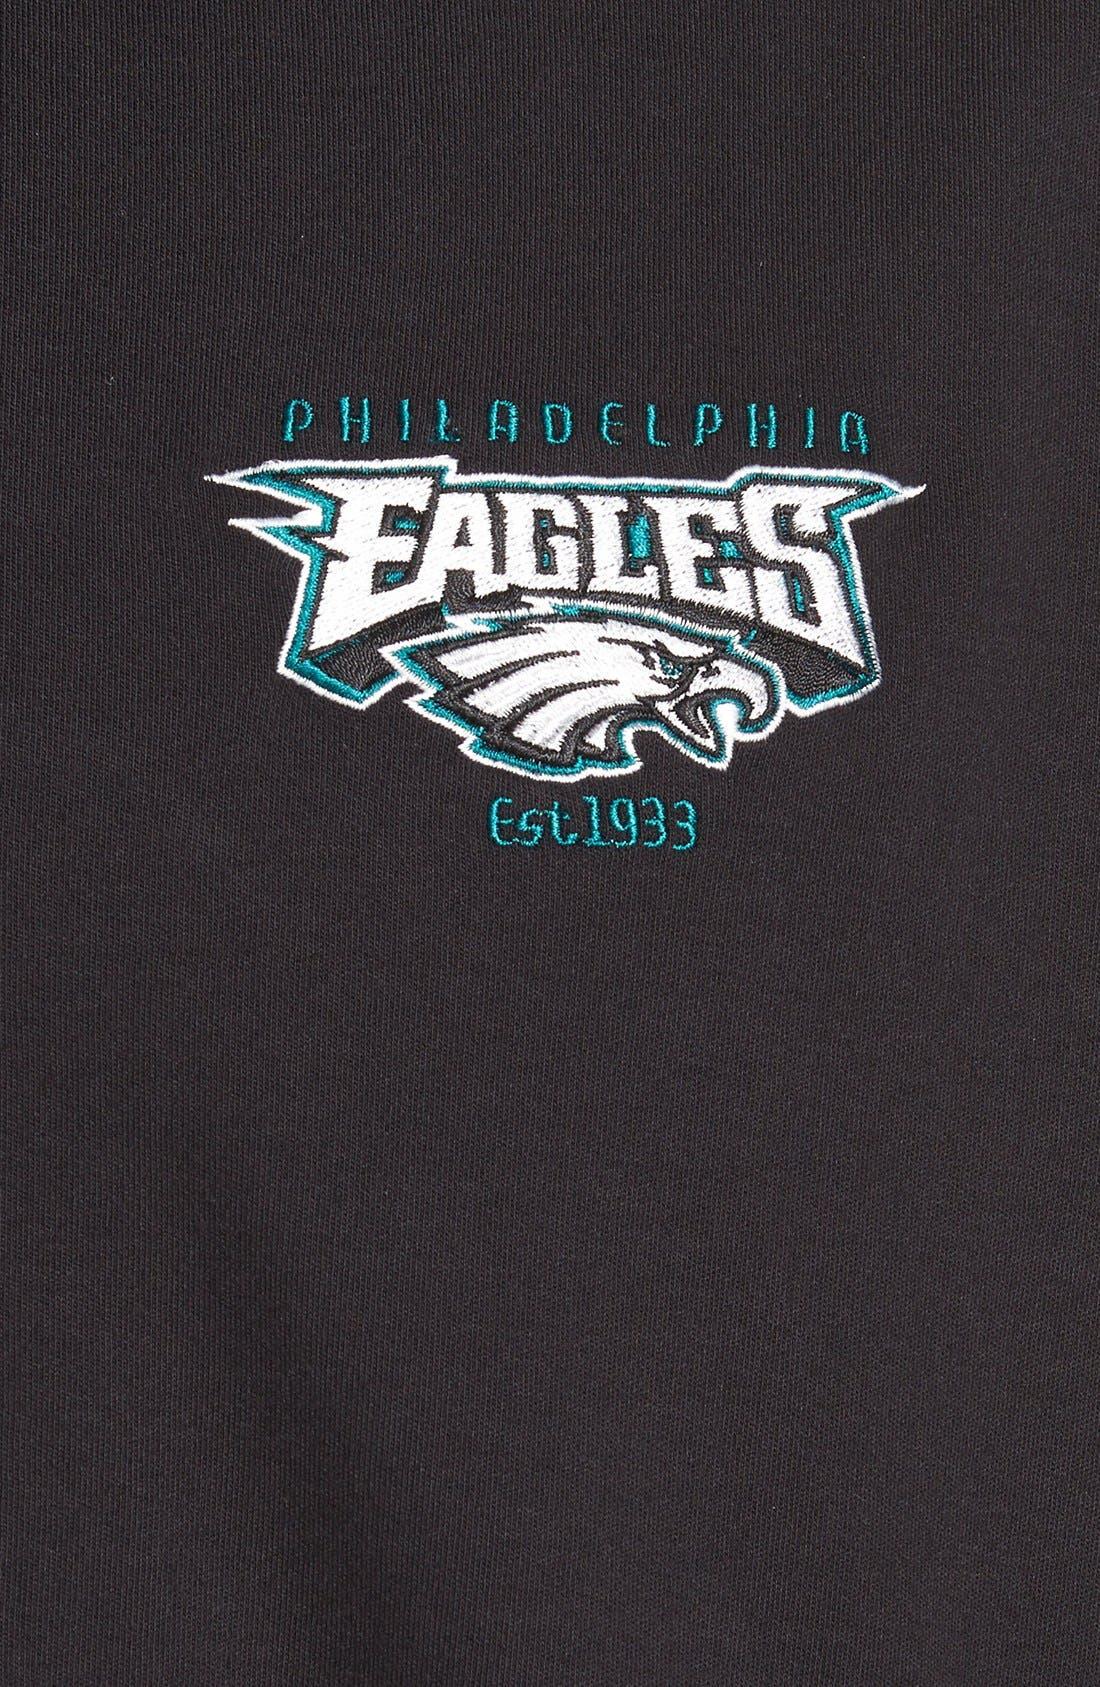 TOMMY BAHAMA,                             'Goal Line - Baltimore Ravens' NFL Full Zip Jacket,                             Alternate thumbnail 2, color,                             001